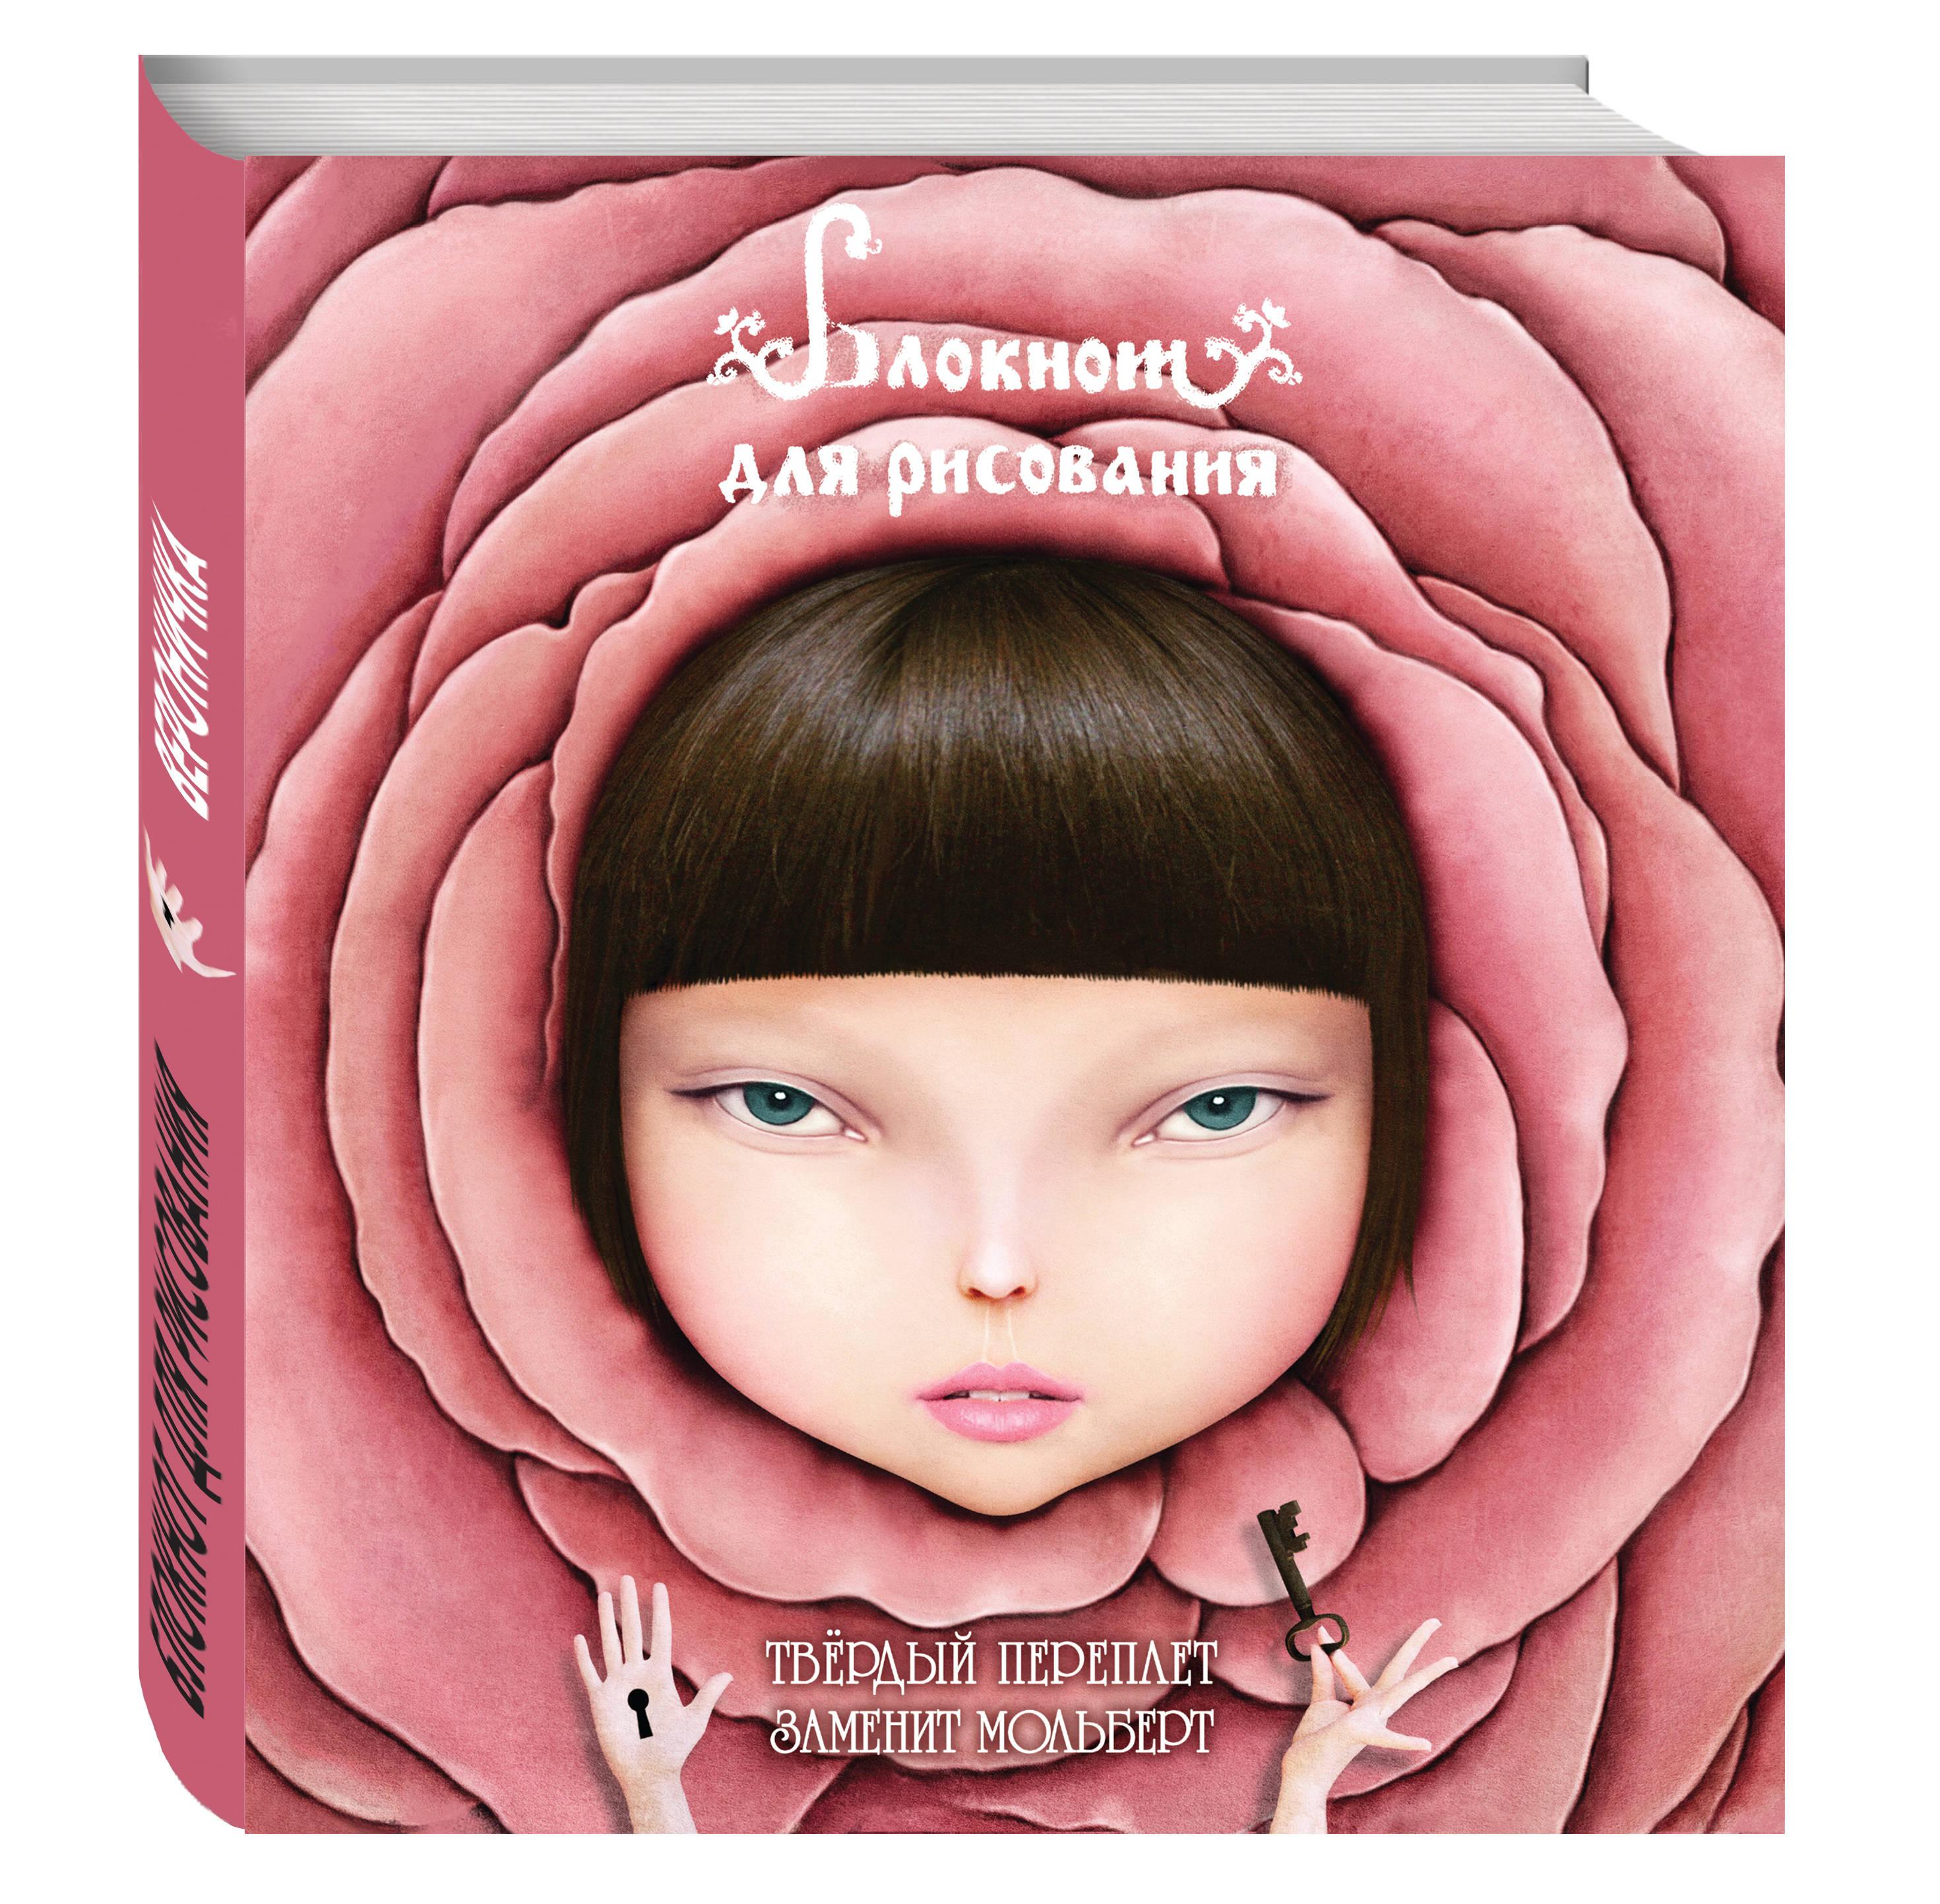 "Блокнот для рисования ""Вероничка"" (твёрдый переплёт, 96 л., большой формат, 255х255 мм) от book24.ru"